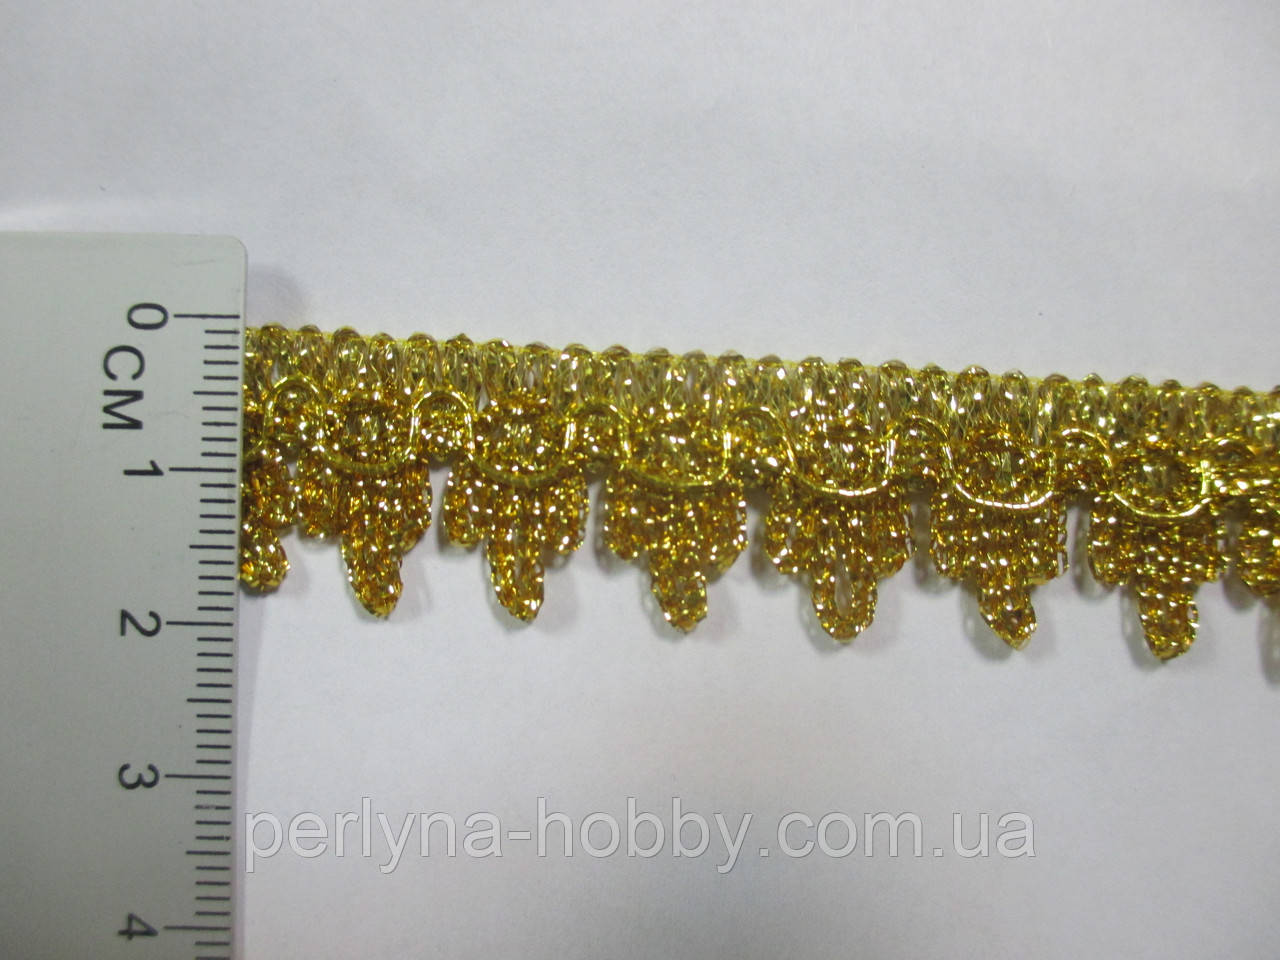 Тесьма декоративная золотая Тасьма декоративна люрекс золото зубчики 1.8см